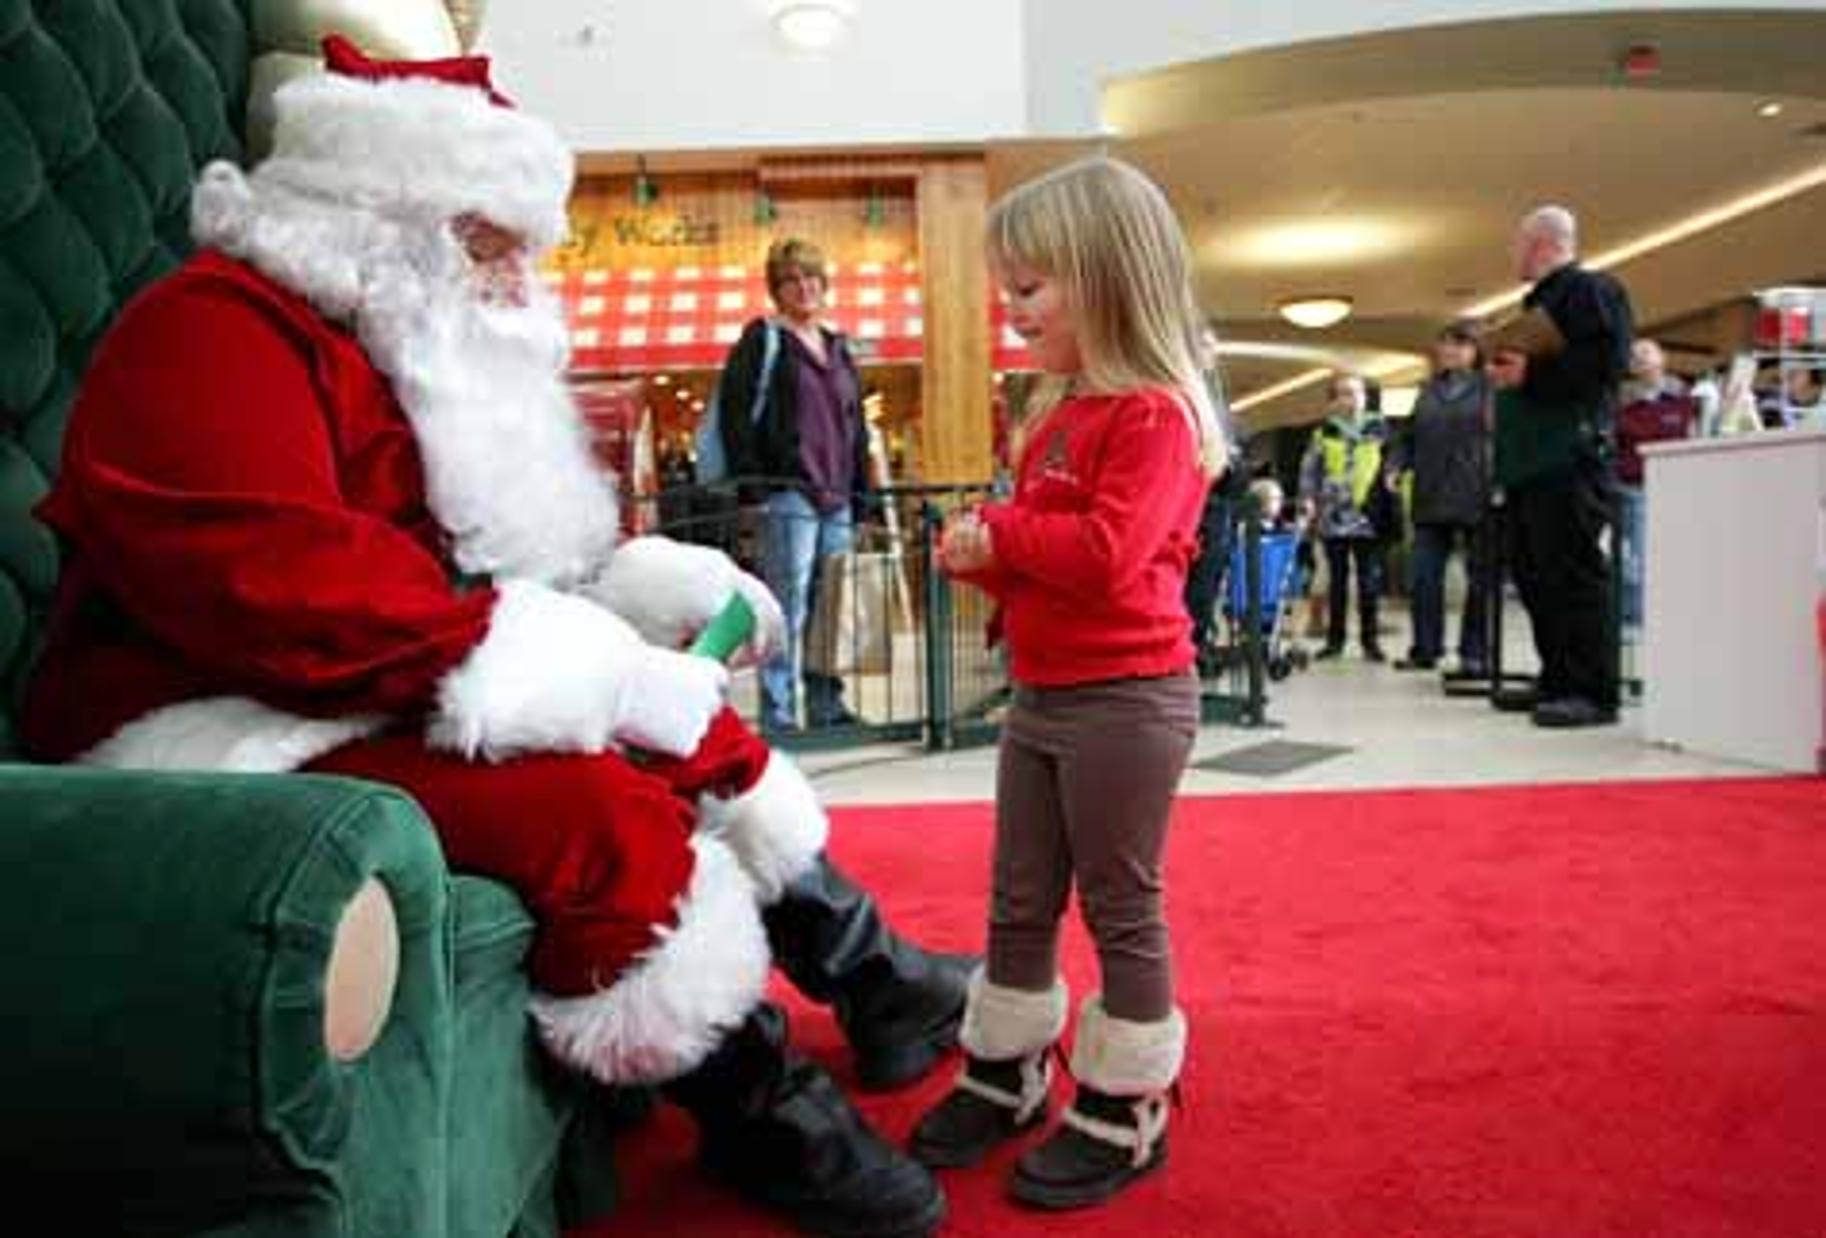 Santa claus at fashion square mall in charlottesville Datenrettung Top Downloads - CHIP